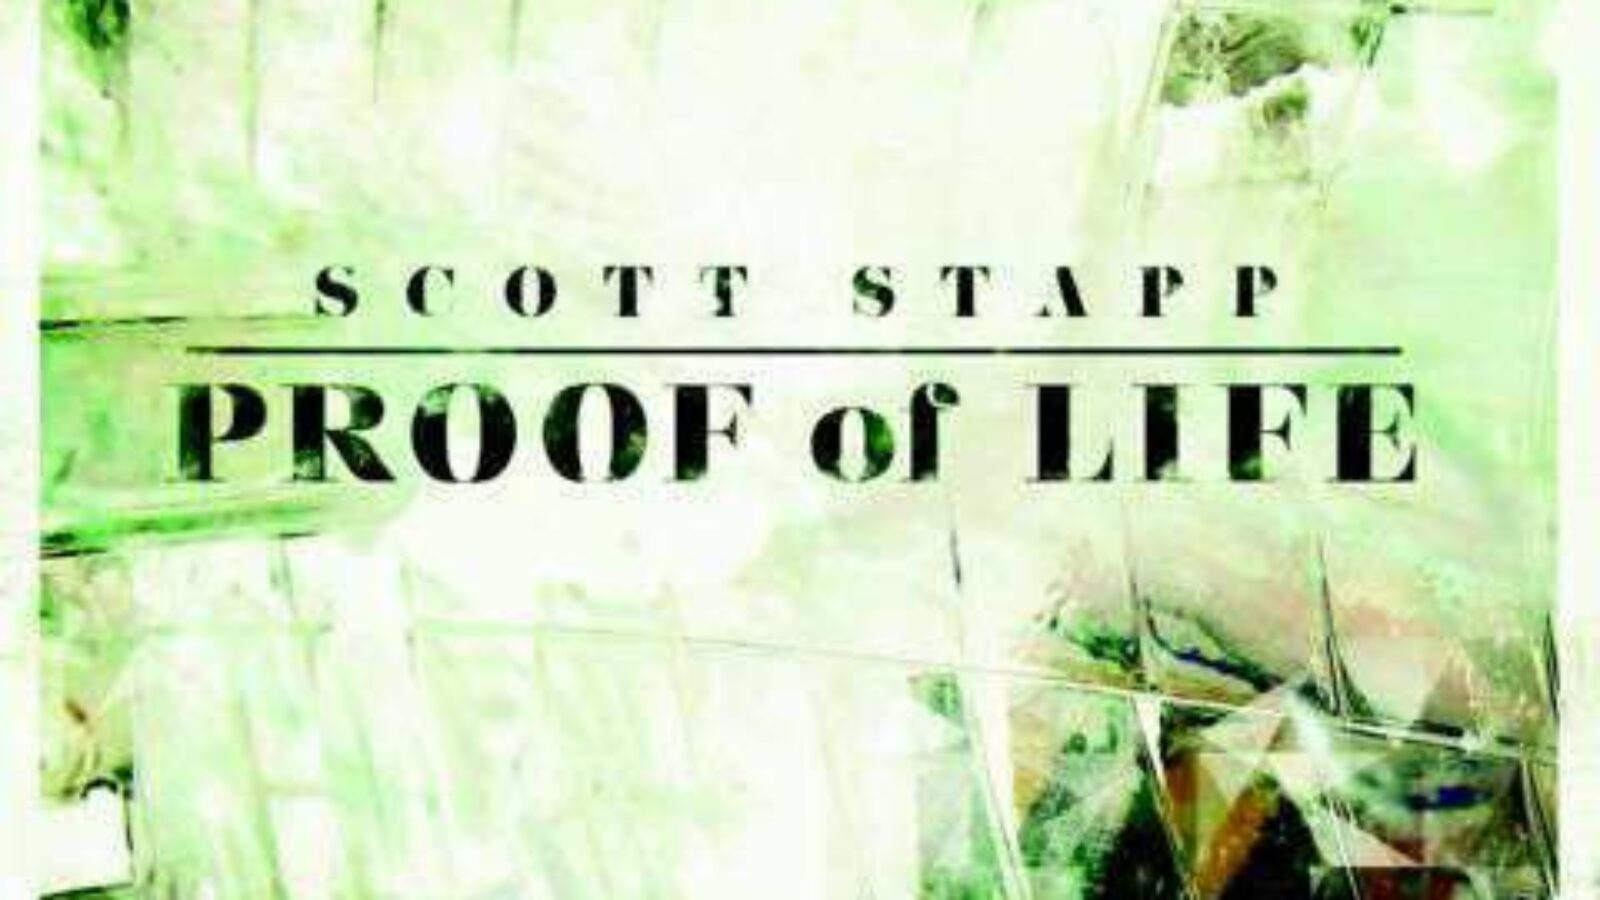 SCOTT STAPP – Proof Of Life